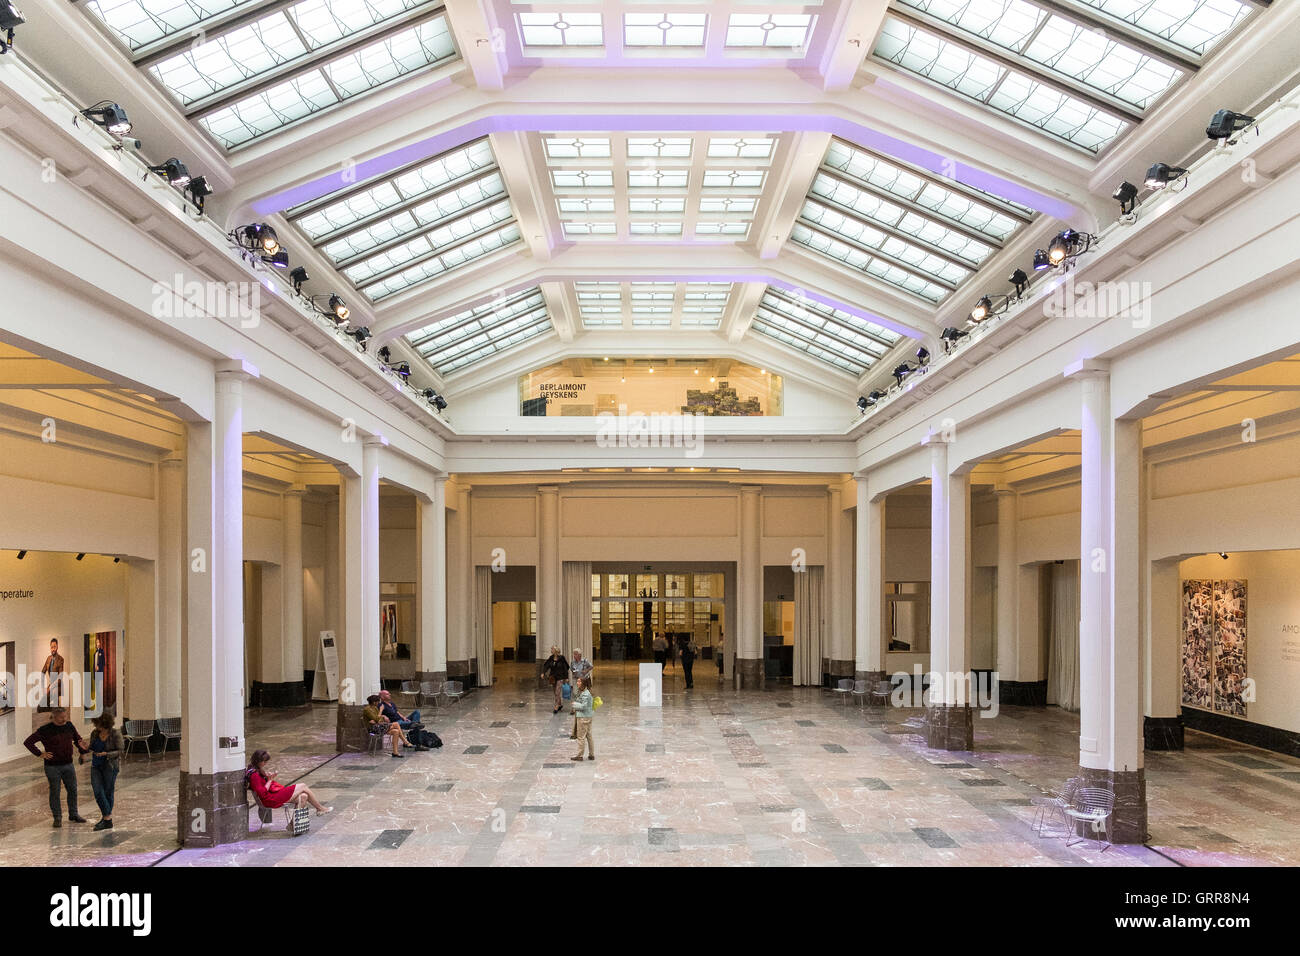 bozar gallery interior brussels belgium beaux arts Stock Photo